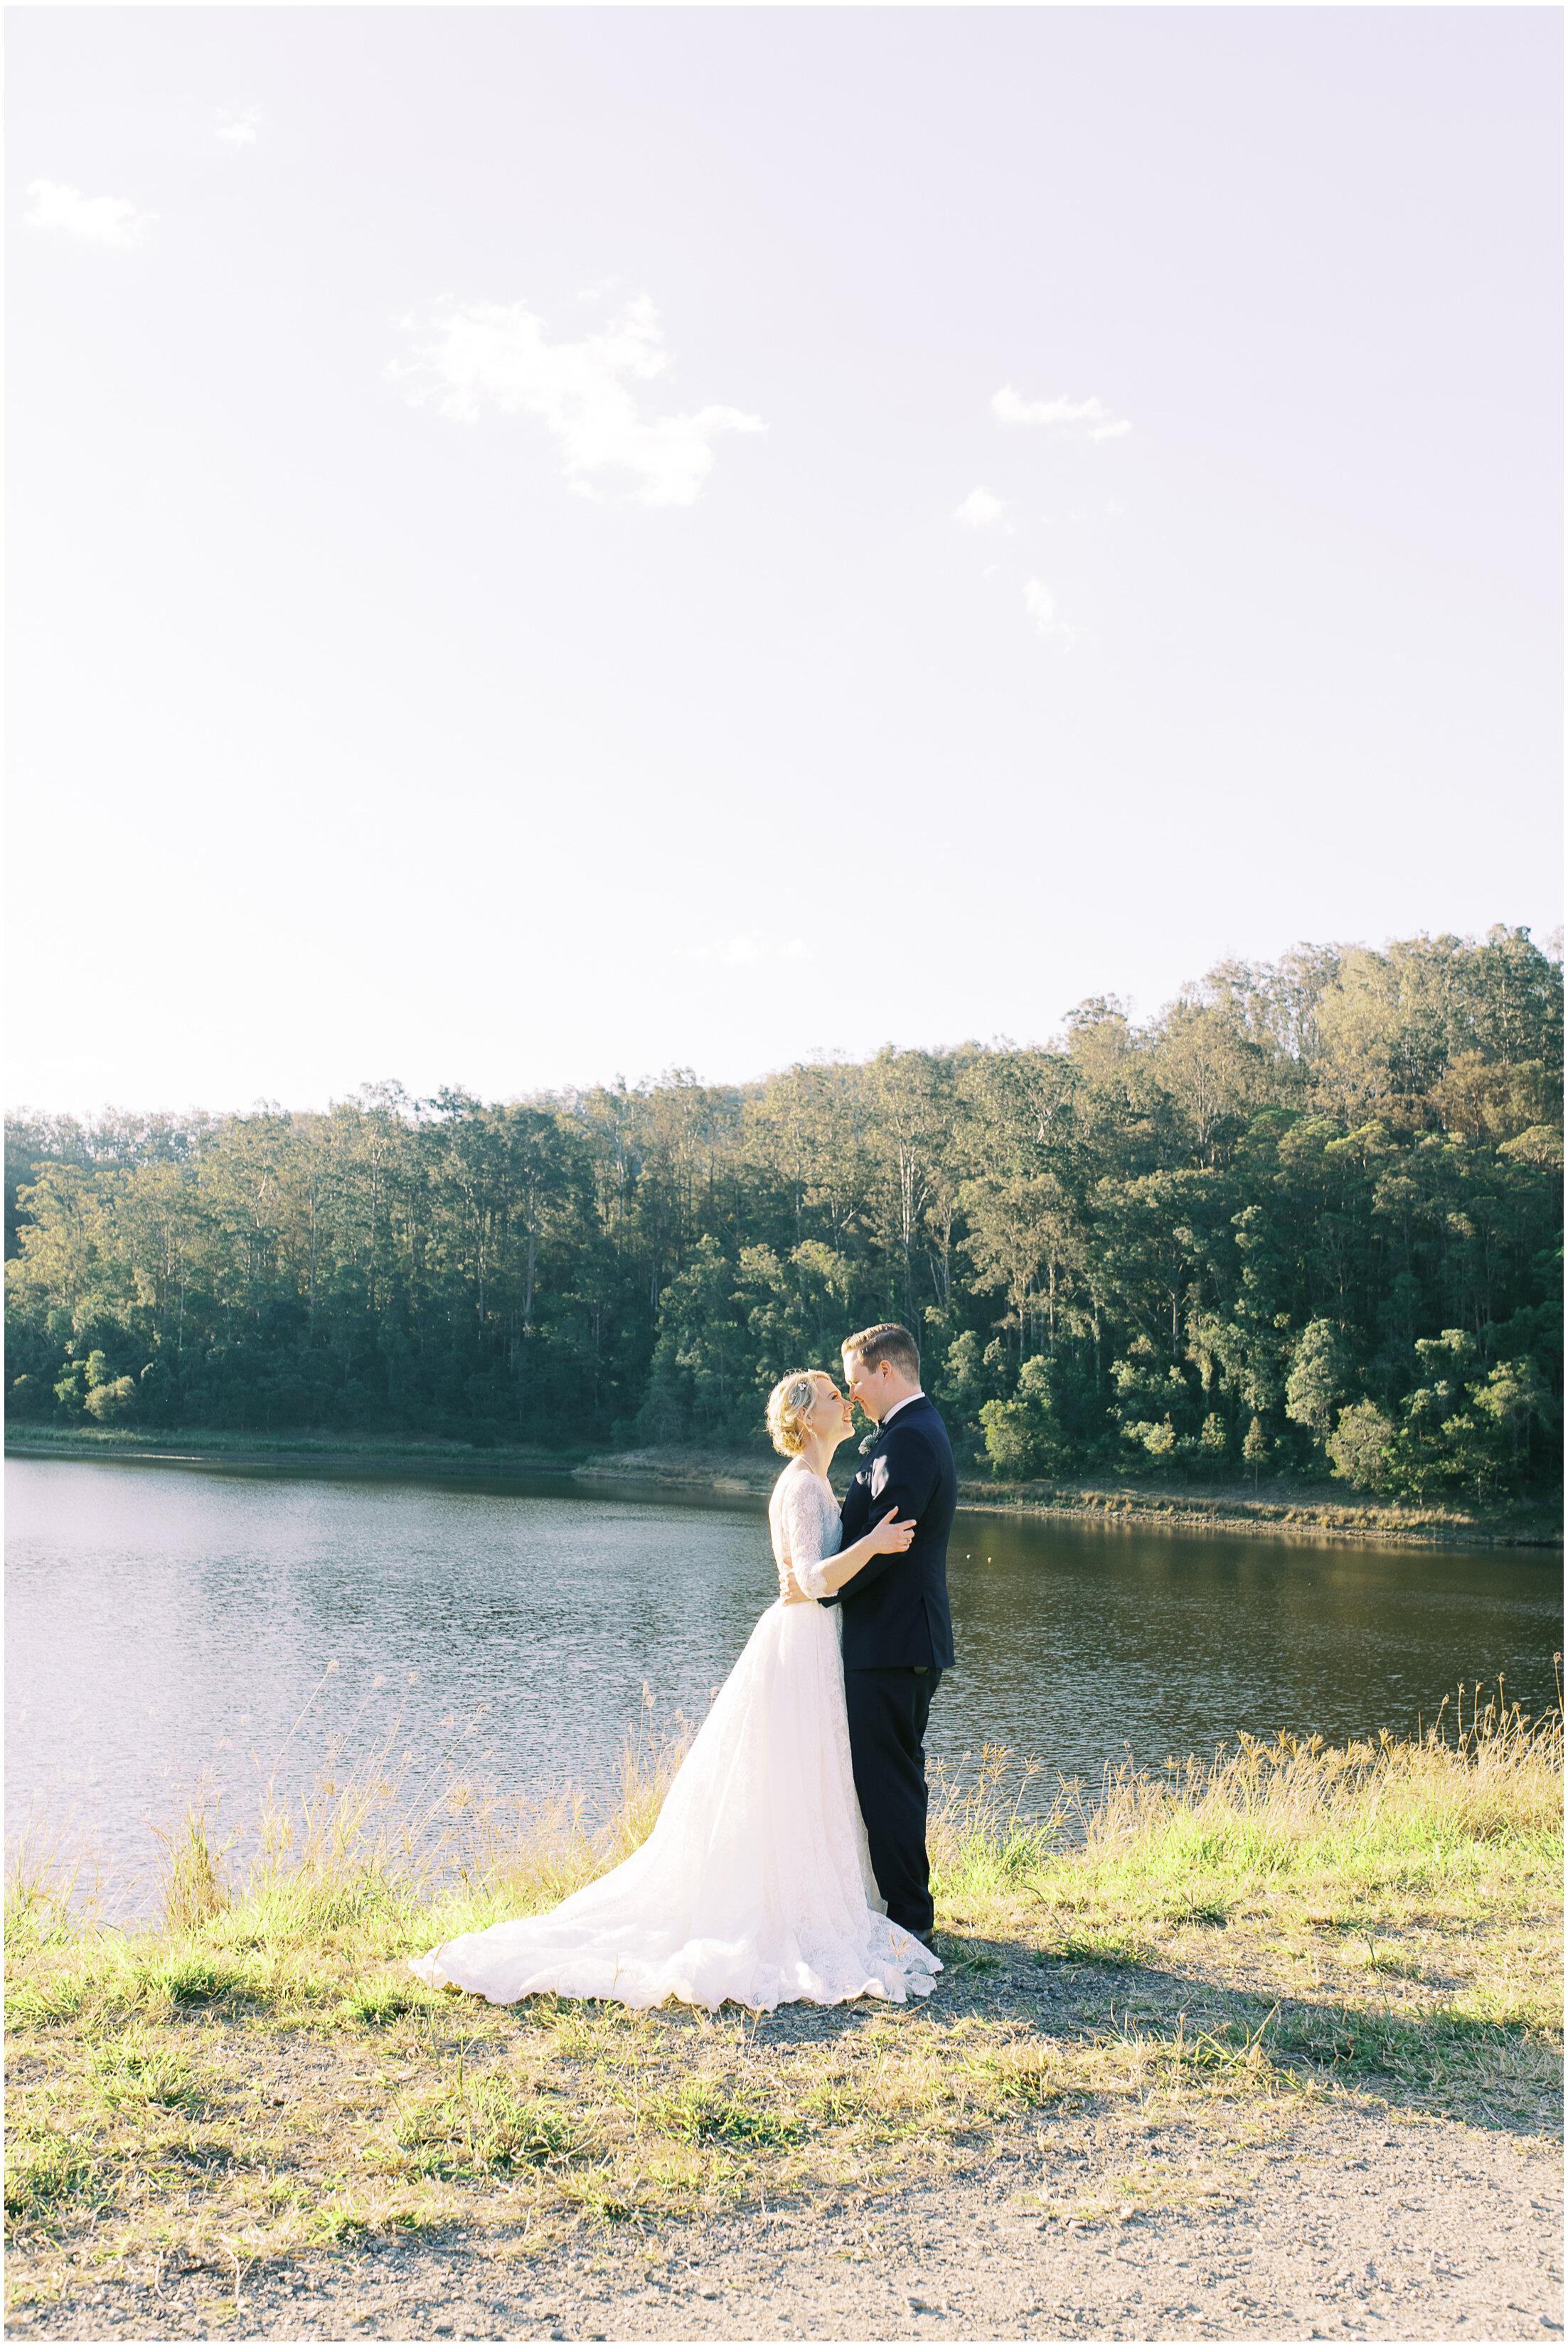 brisbane-fine-art-wedding-photographer-lauren-olivia-luxury-wedding-australia-25.jpg